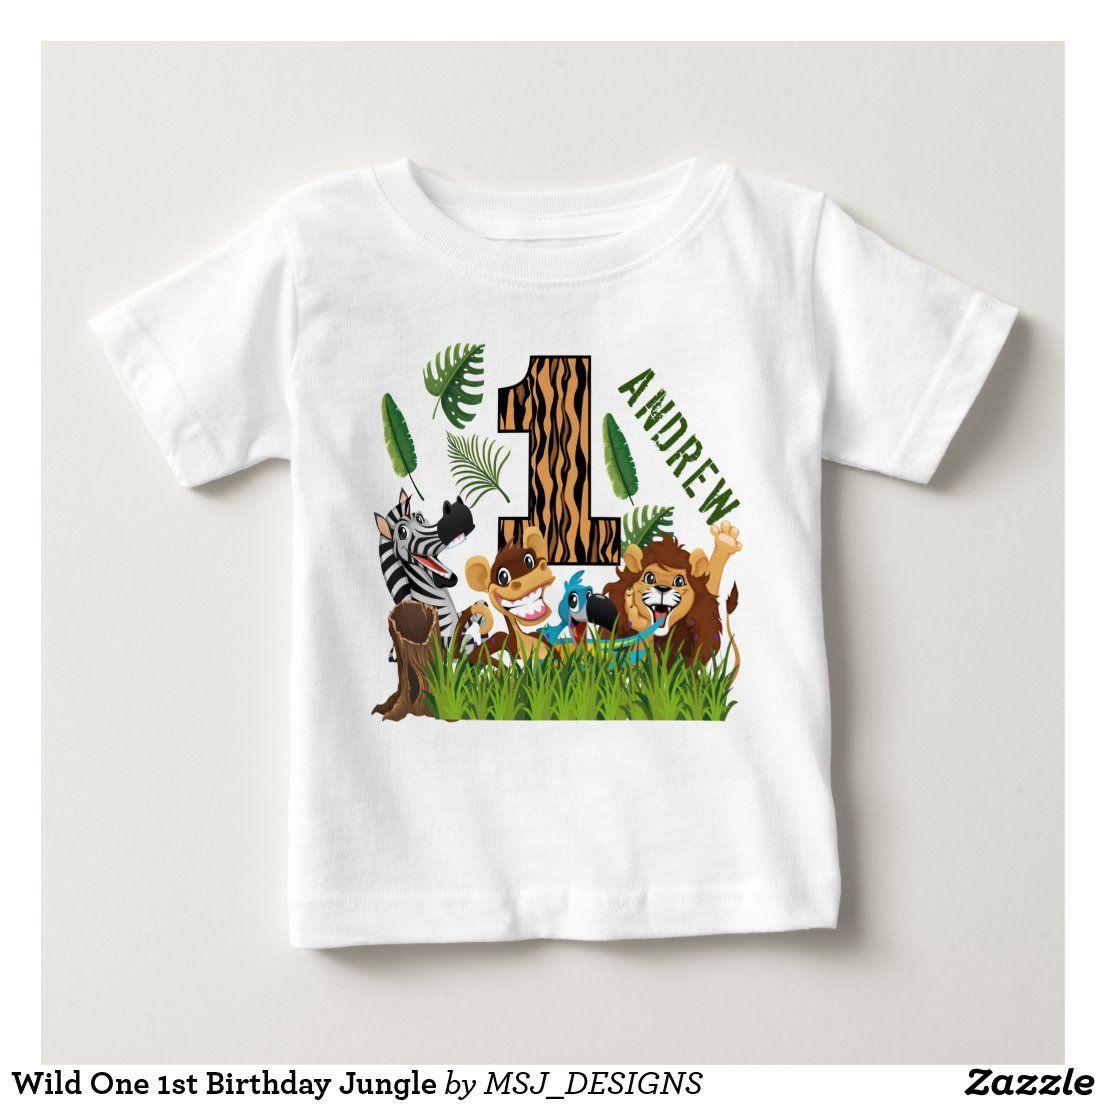 Wild One 1st Birthday Jungle Baby TShirt in